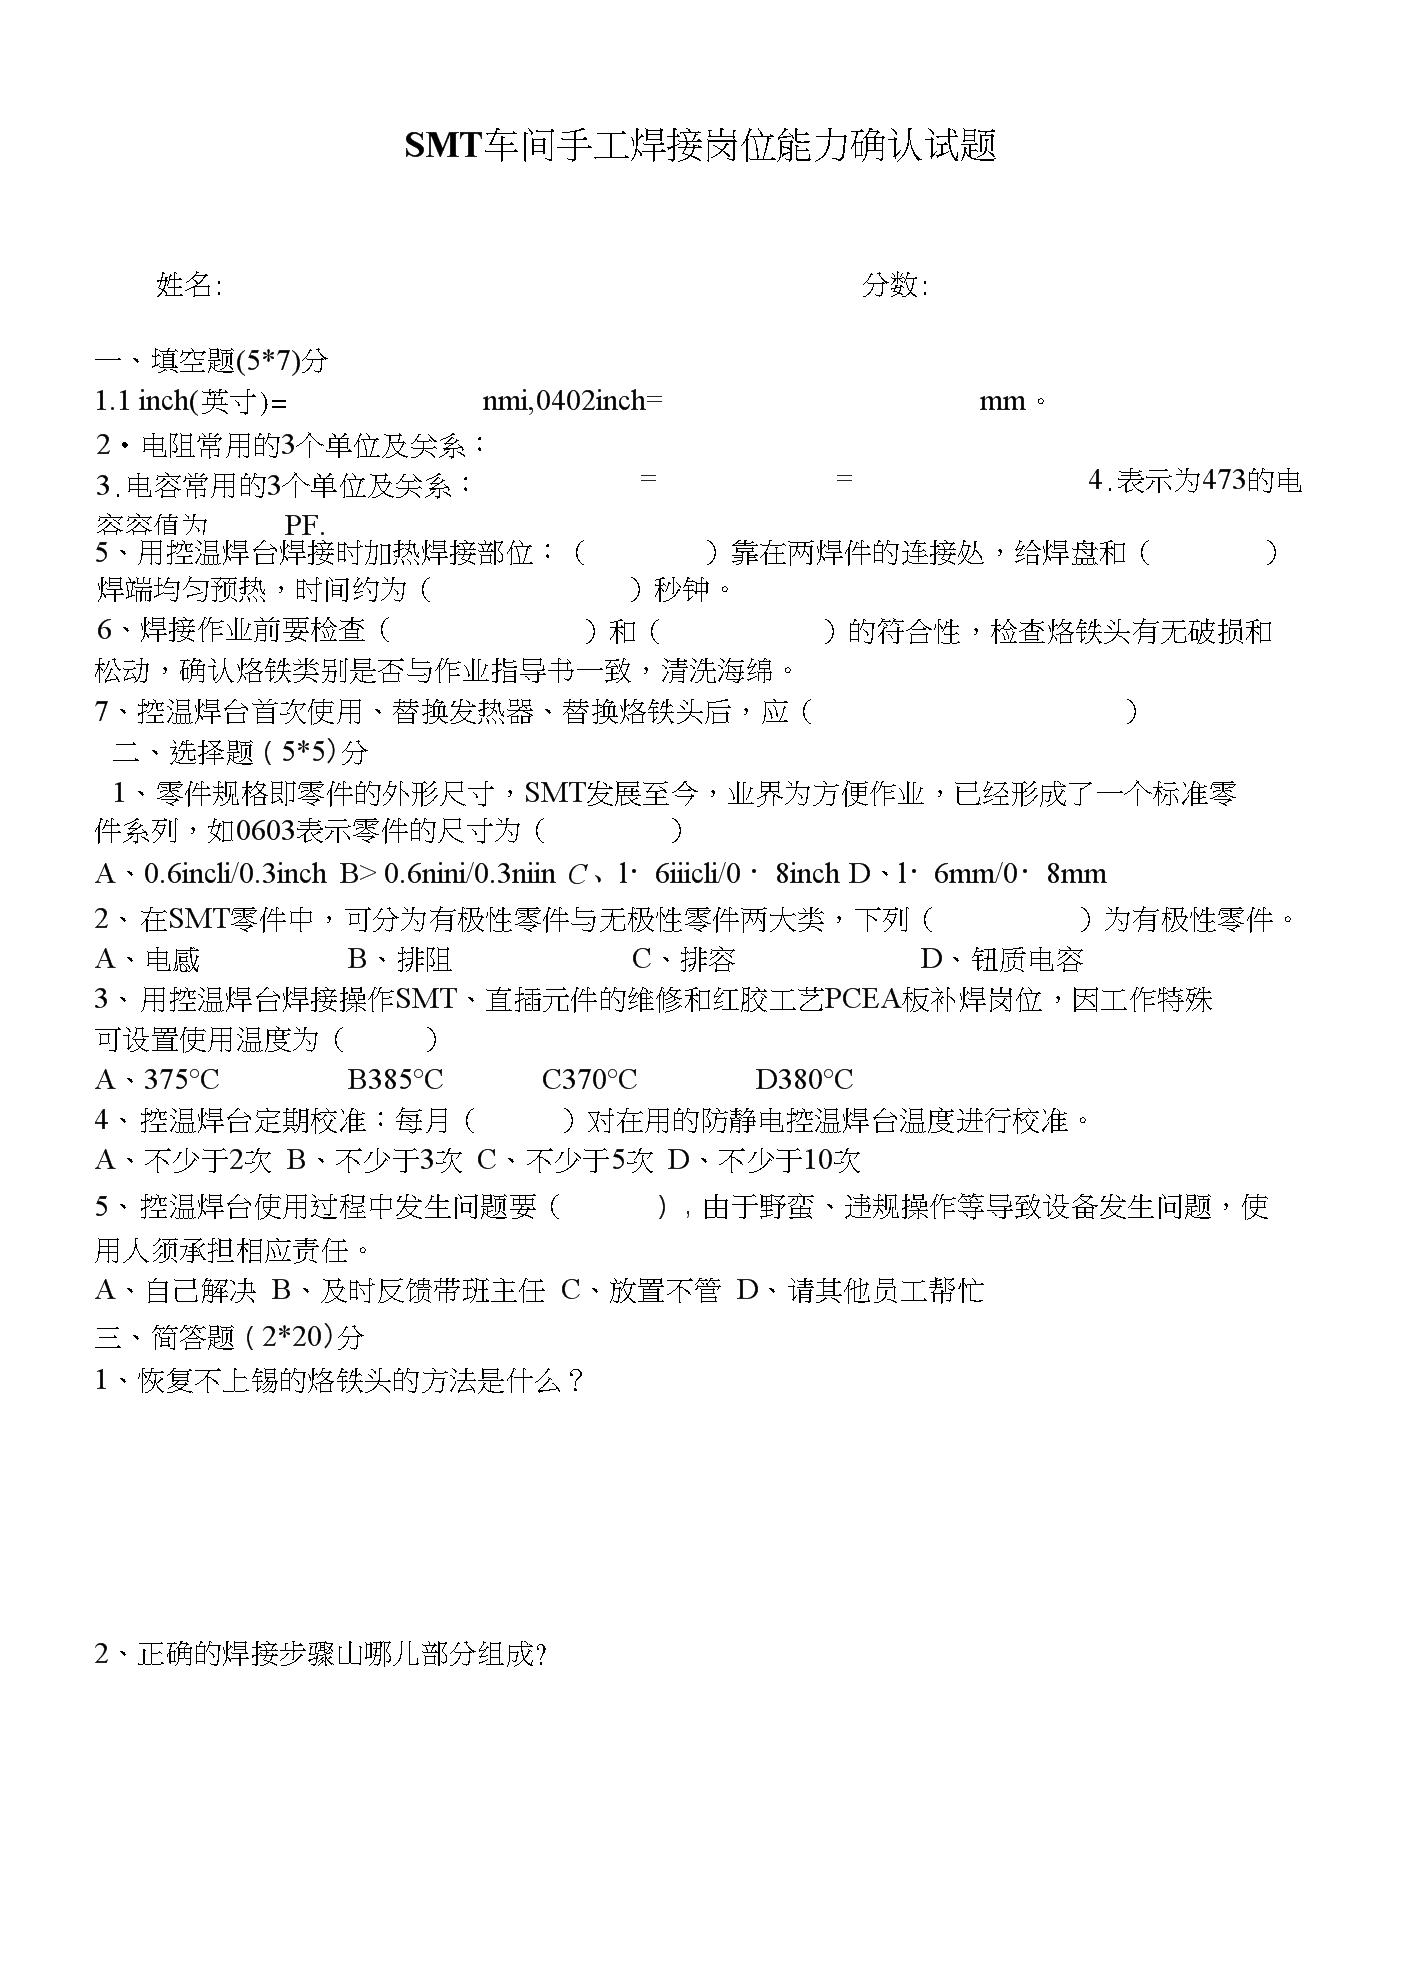 SMT车间手工焊接岗位能力确认试题.docx